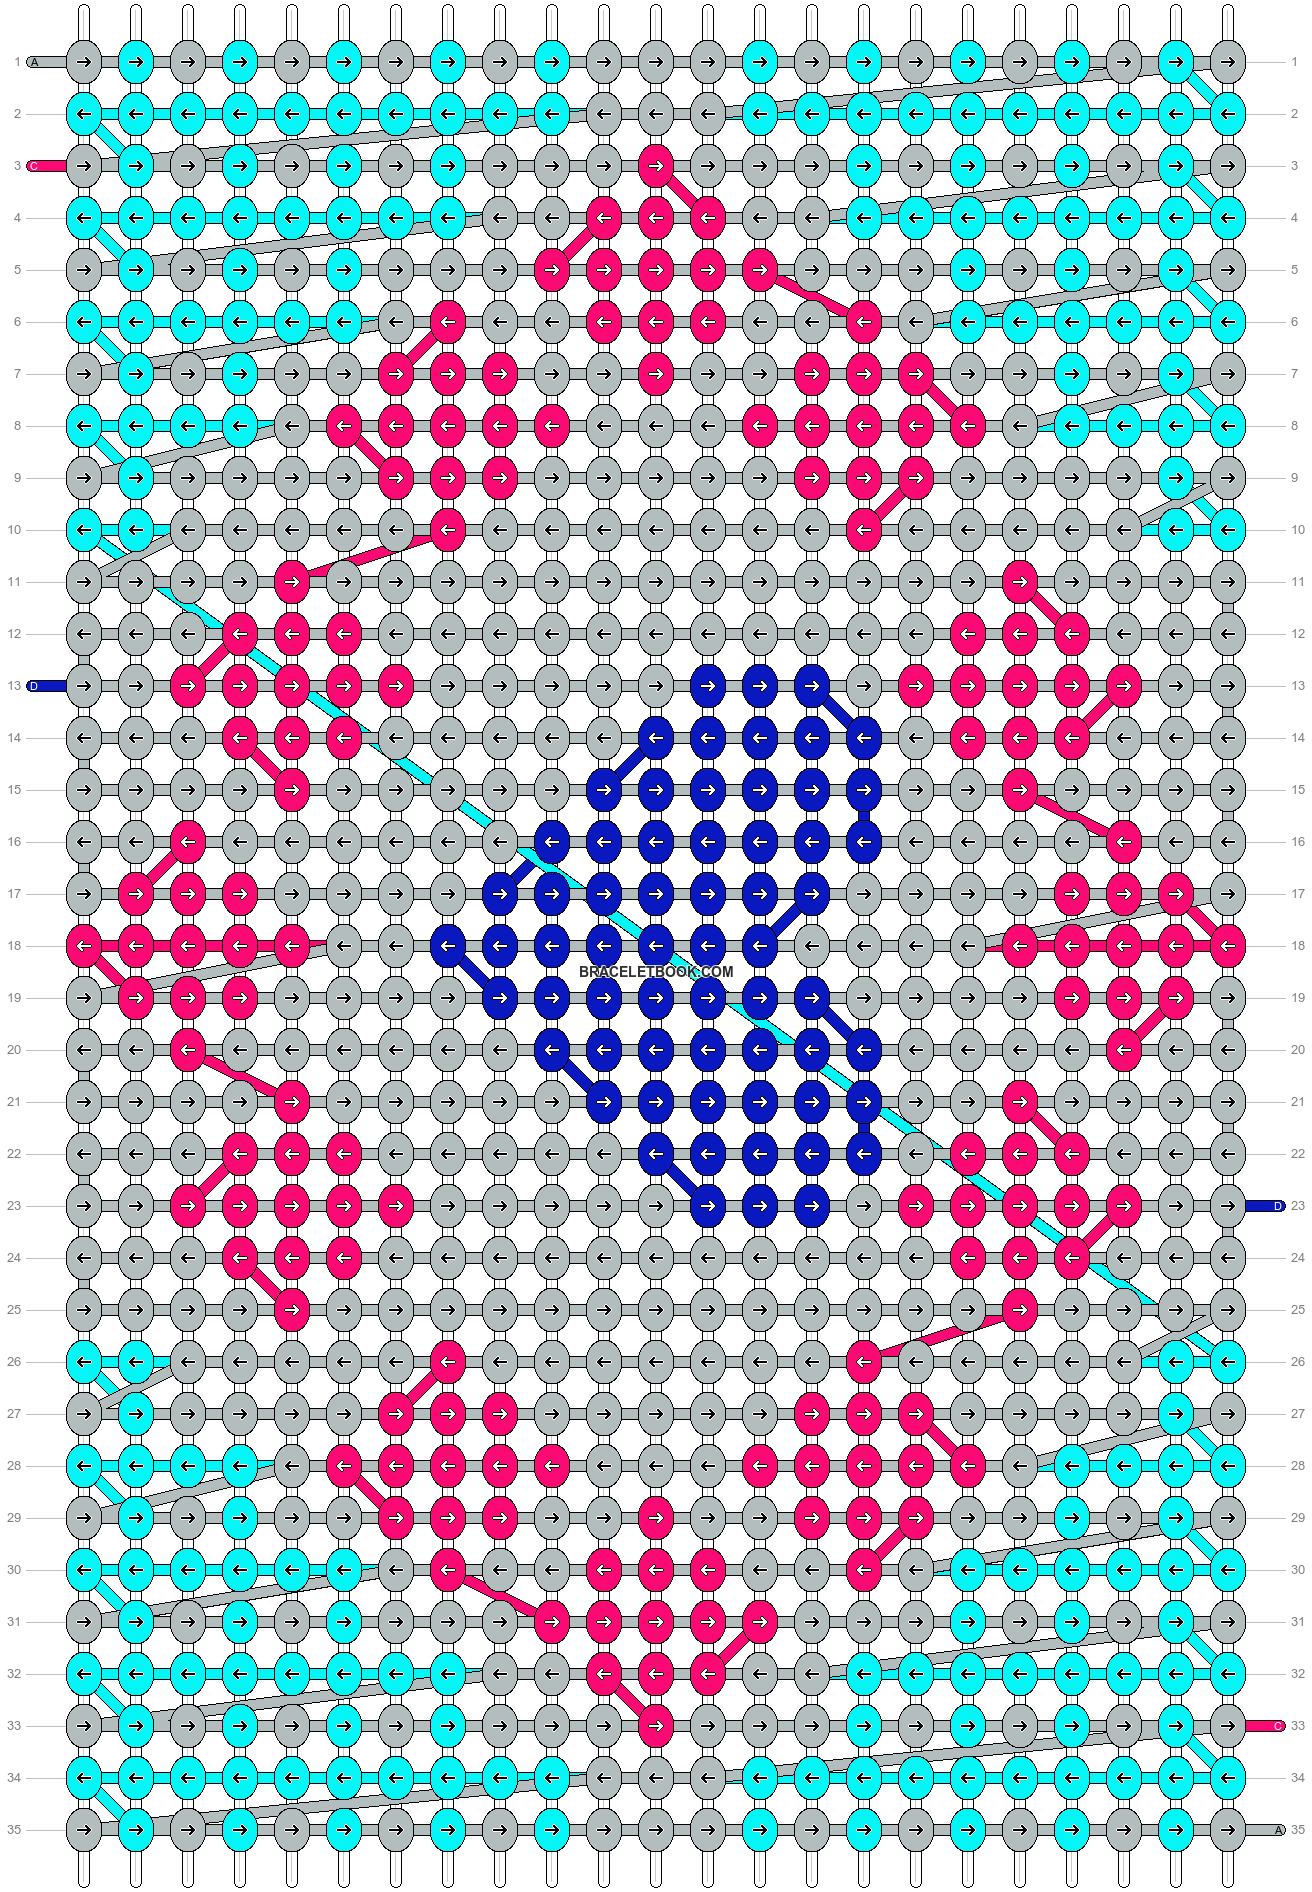 Alpha Pattern #10432 added by milbug